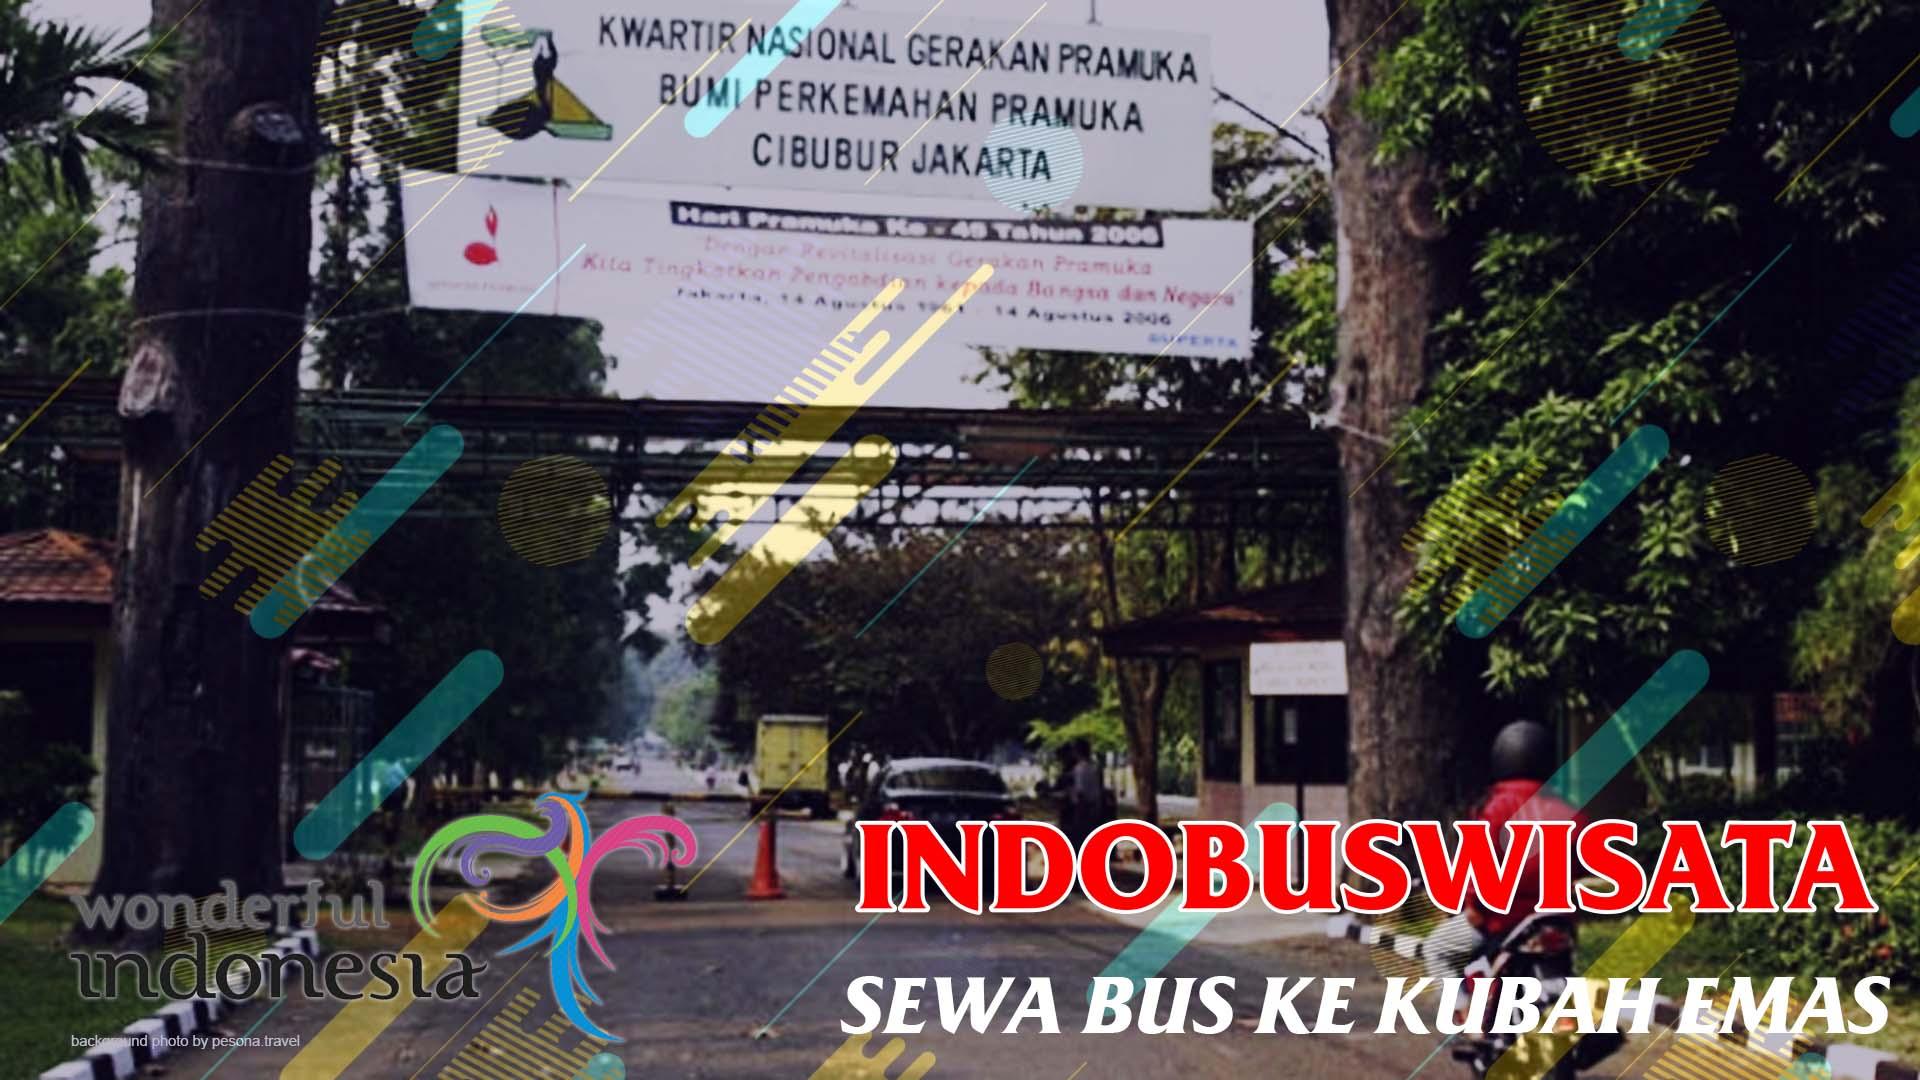 Sewa Bus Ke Buperta - Indobuswisata